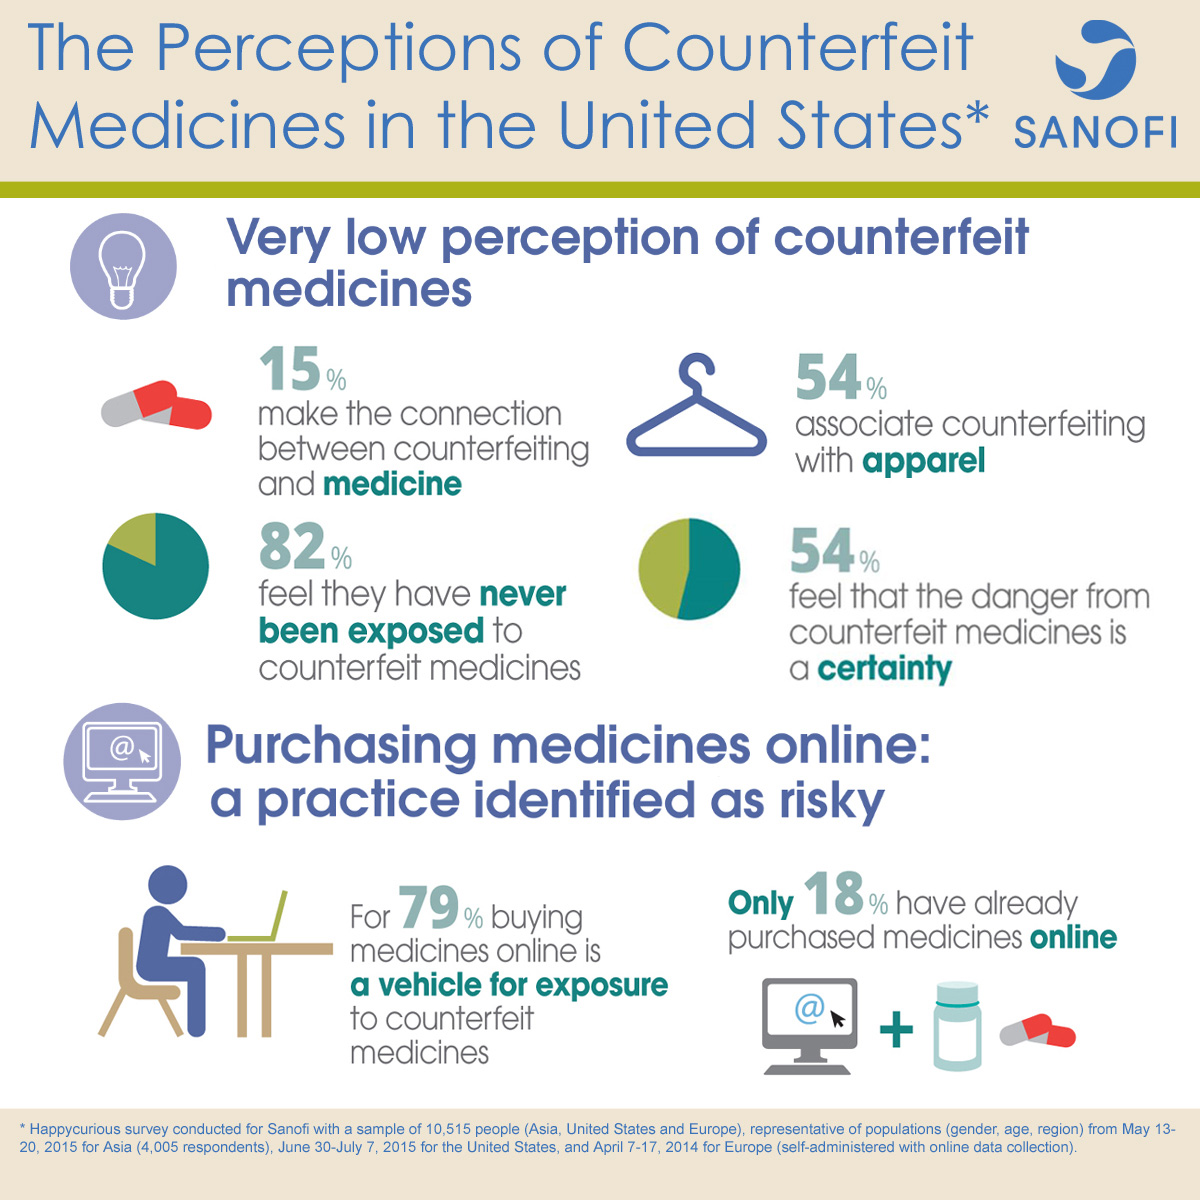 U.S. Counterfeit Medicines Survey Infographic